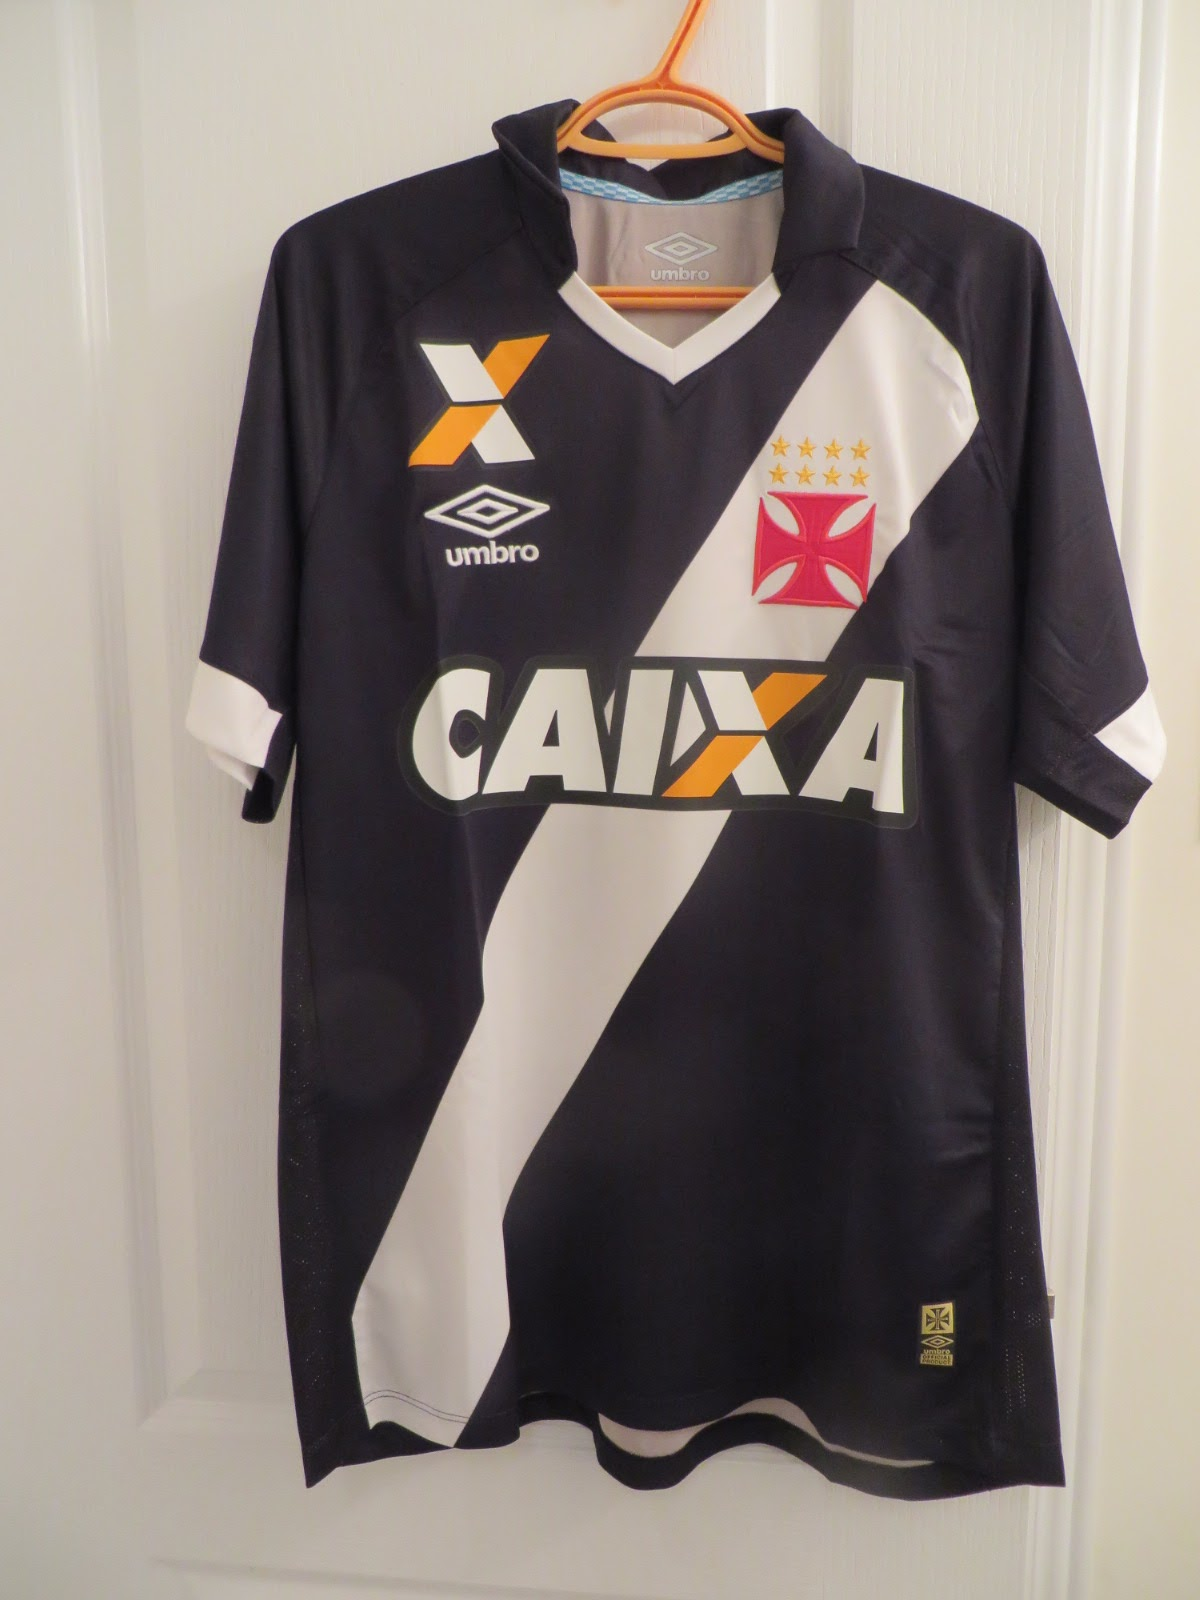 078809871ff0f My Umbro Football Jerseys Collection  Vasco da Gama 2015 Home S S Jersey